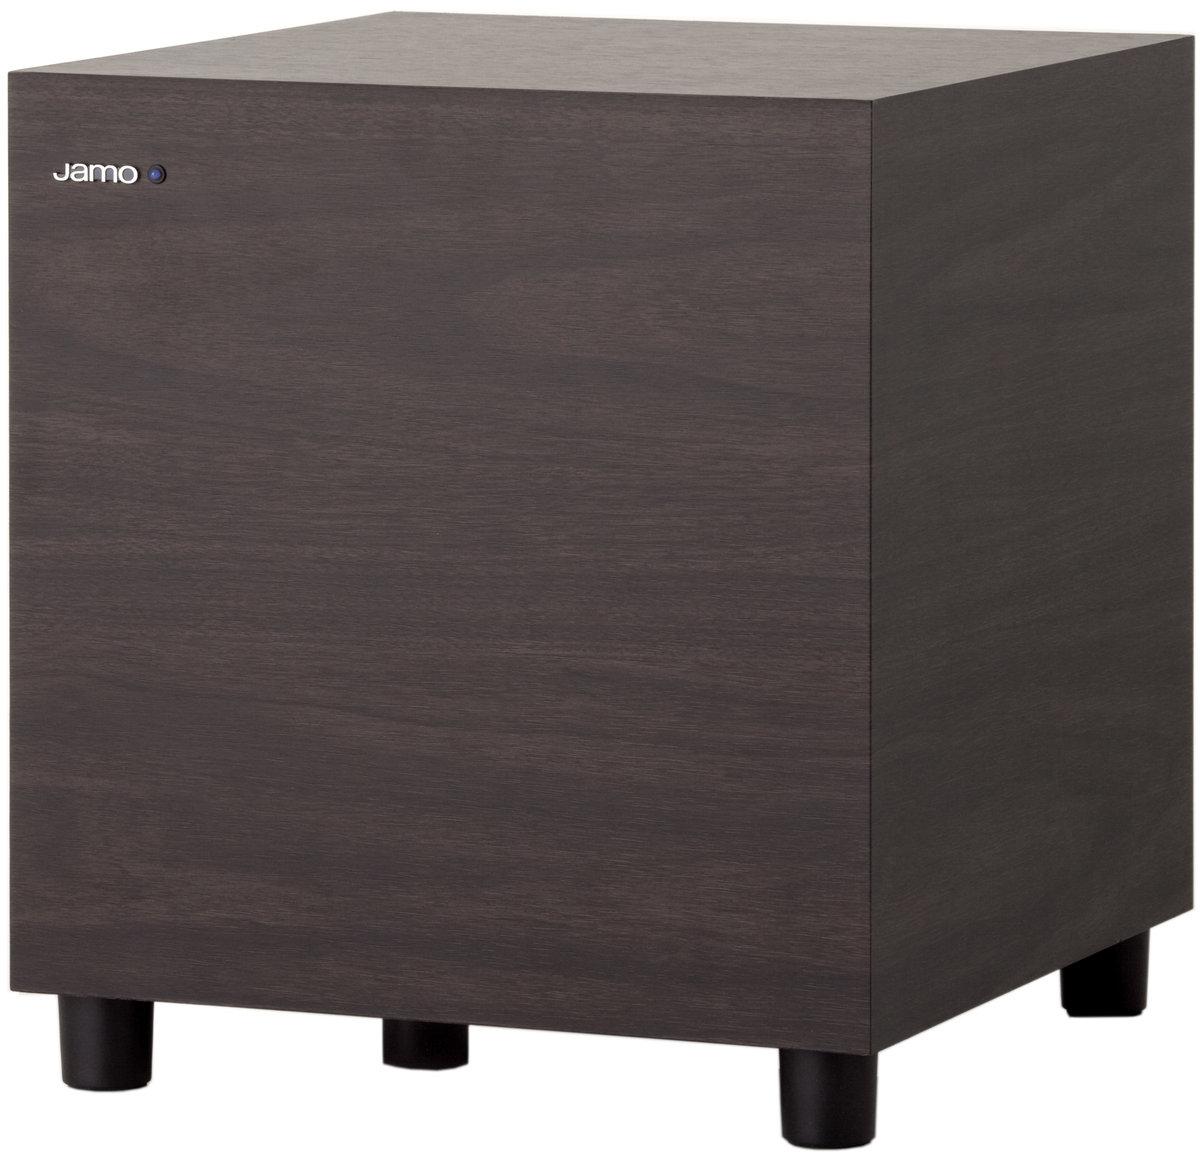 jamo sub 210 caissons de basses son vid. Black Bedroom Furniture Sets. Home Design Ideas